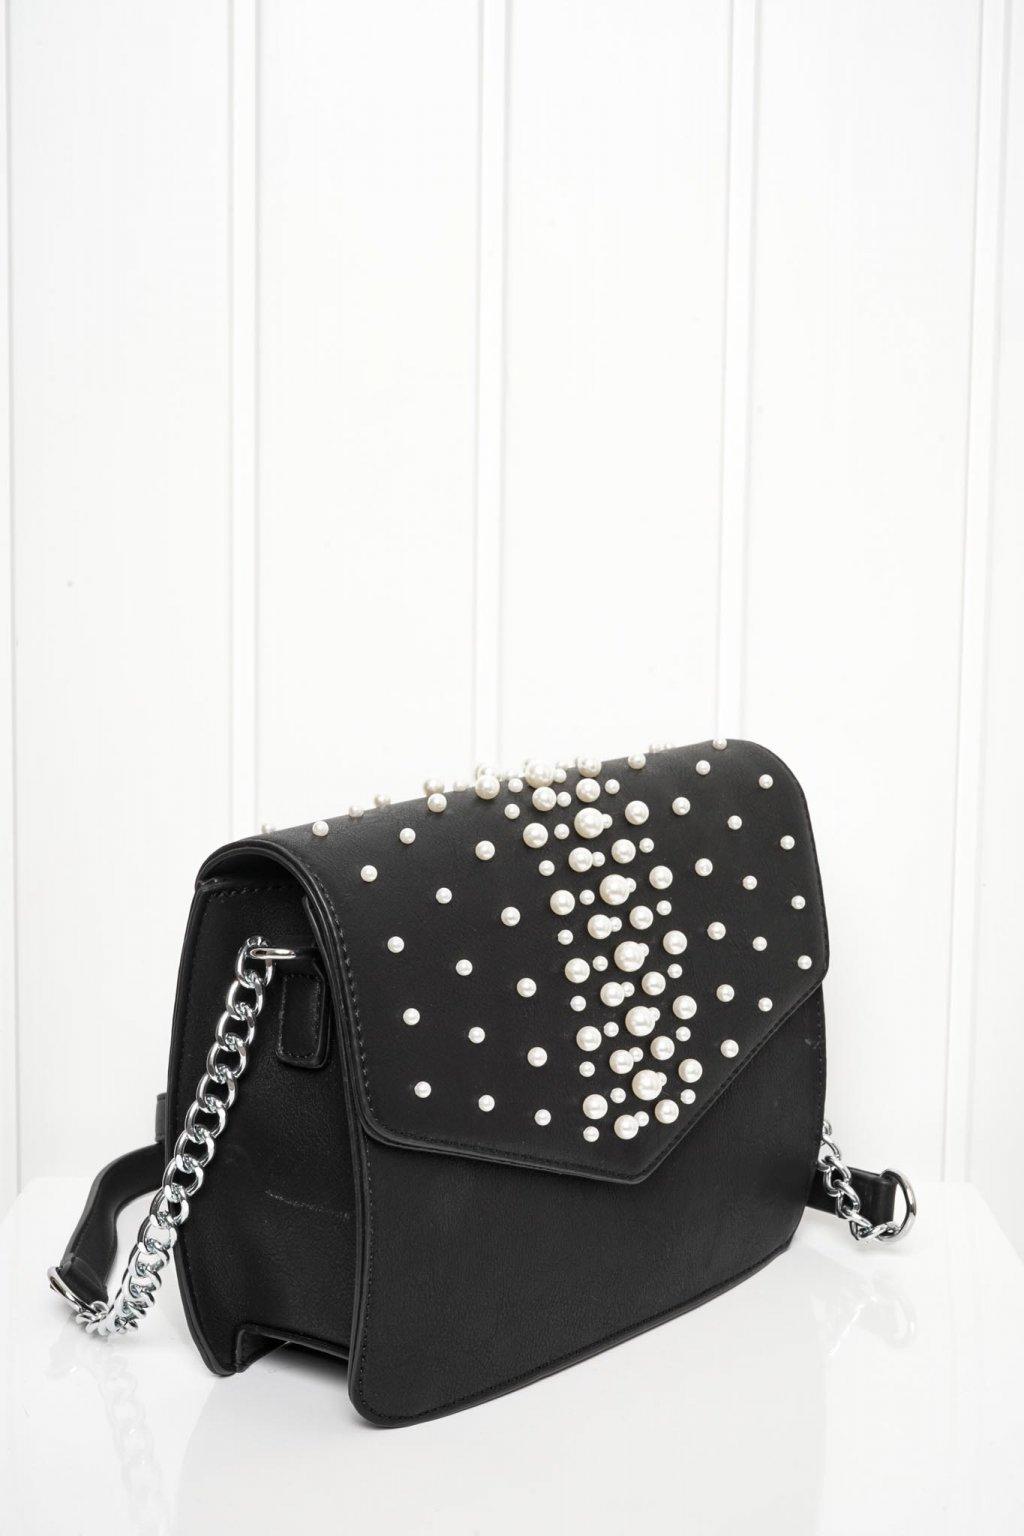 Kabelka, crossbody, ruksak, shopping bag, shopperka, 302